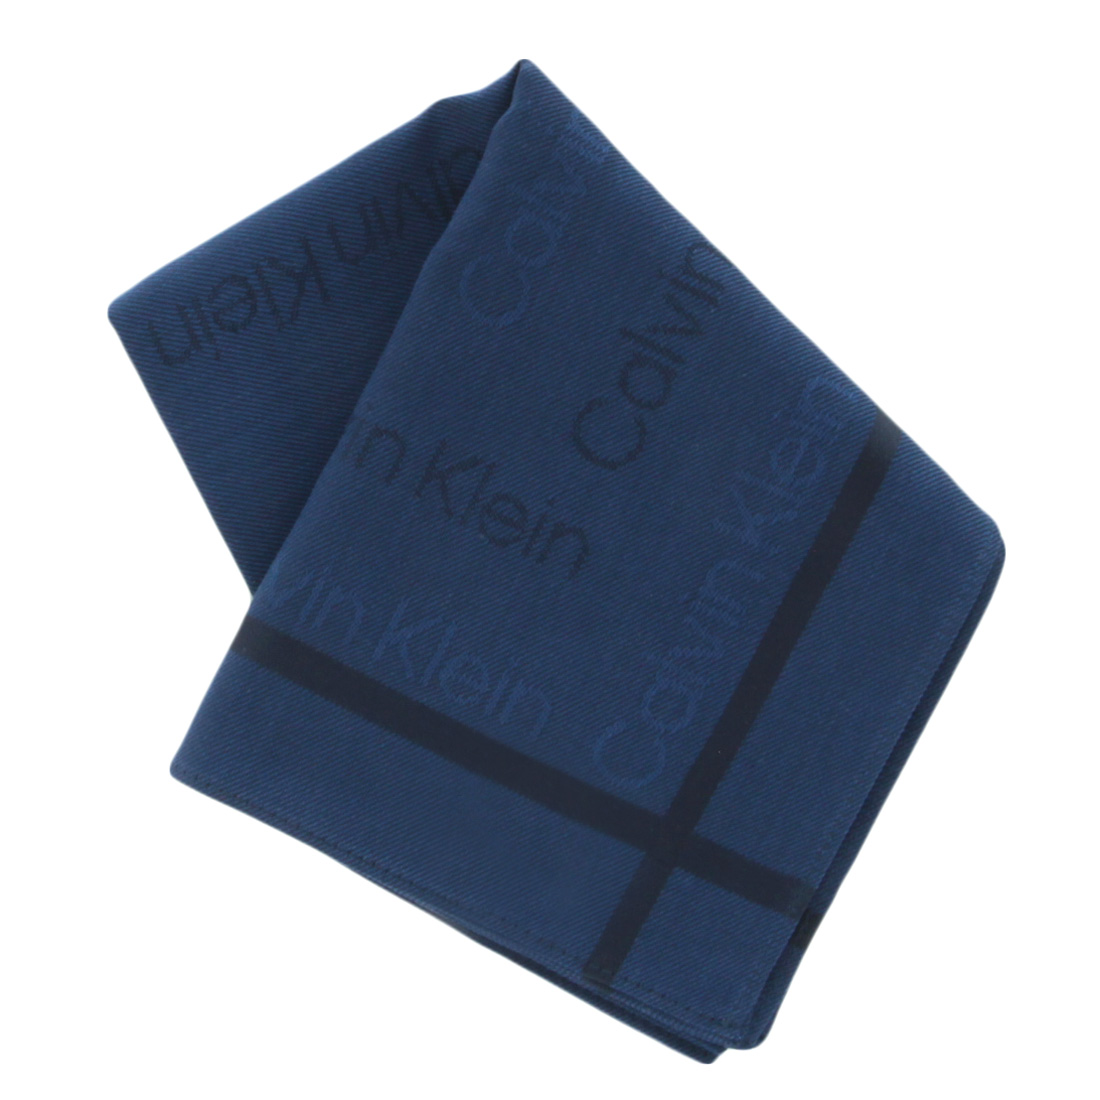 Calvin Klein カルバン ◆高品質 クライン メンズハンカチ ネイビー 数量限定アウトレット最安価格 1554